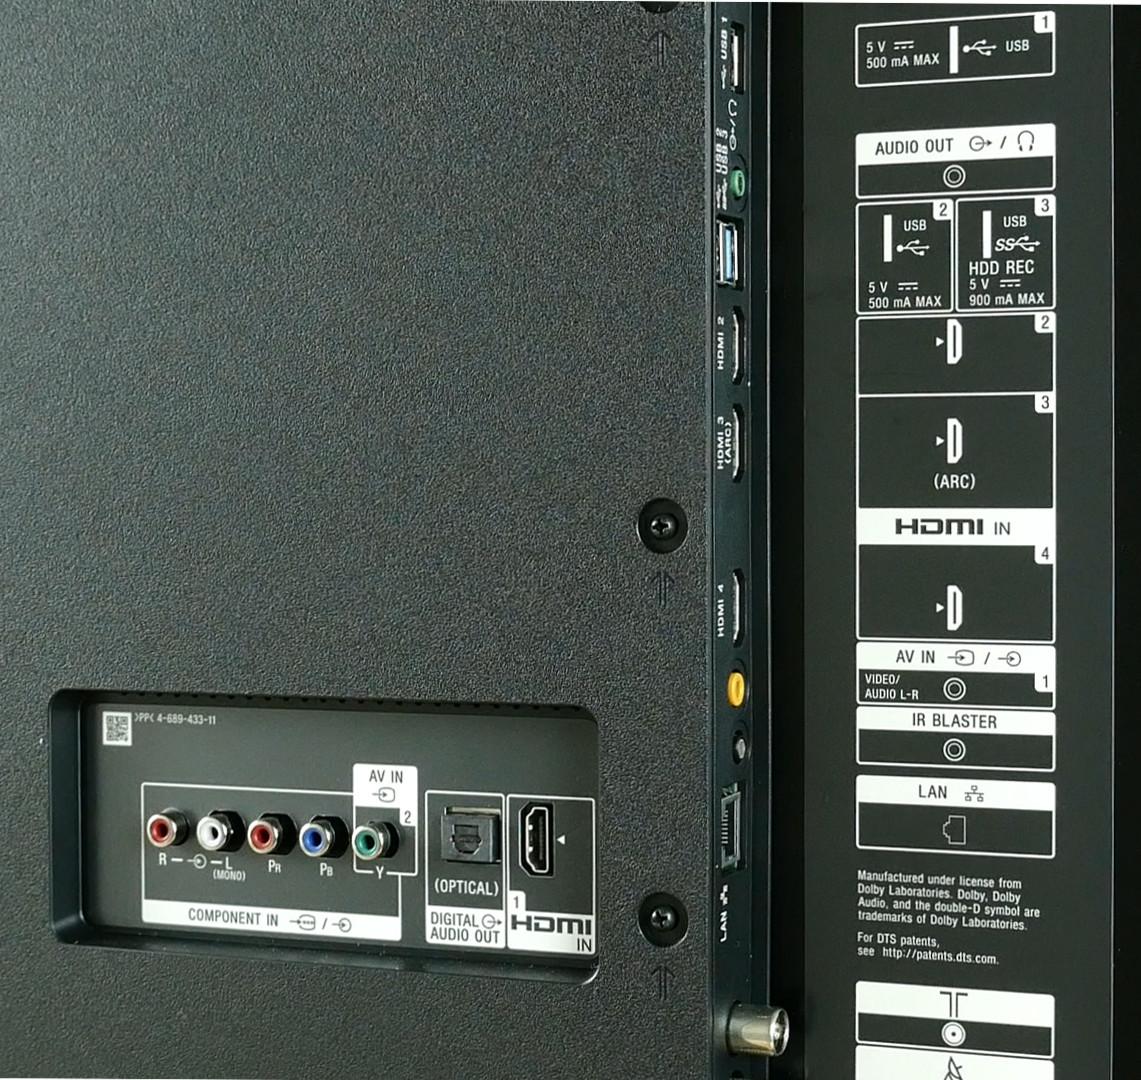 Sony Kd 65xe9005 Xe90 X900e Review